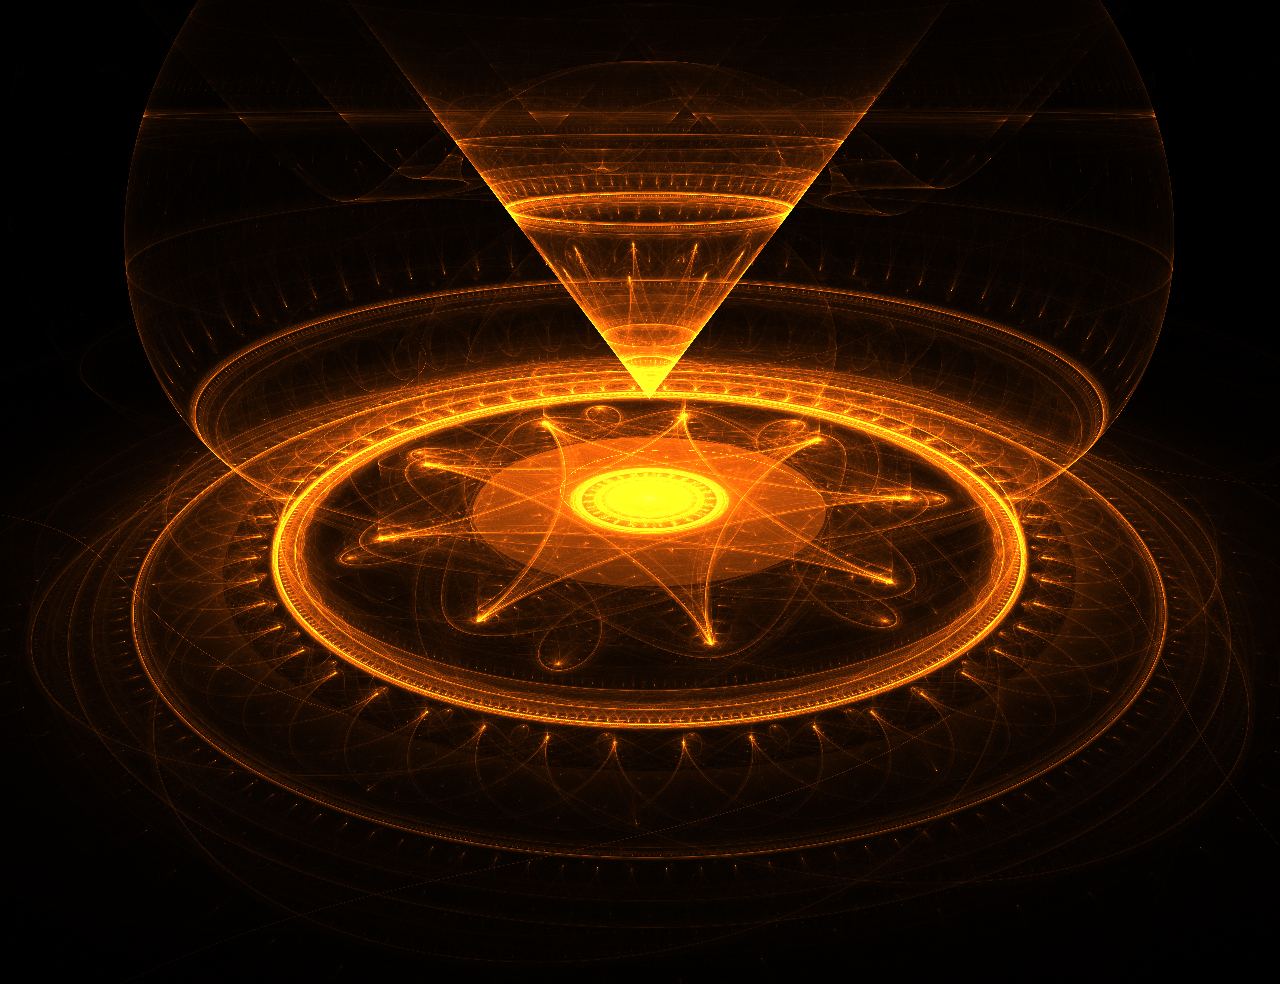 hologram by xmandypandyx high resolution HD Wallpaper - General ...